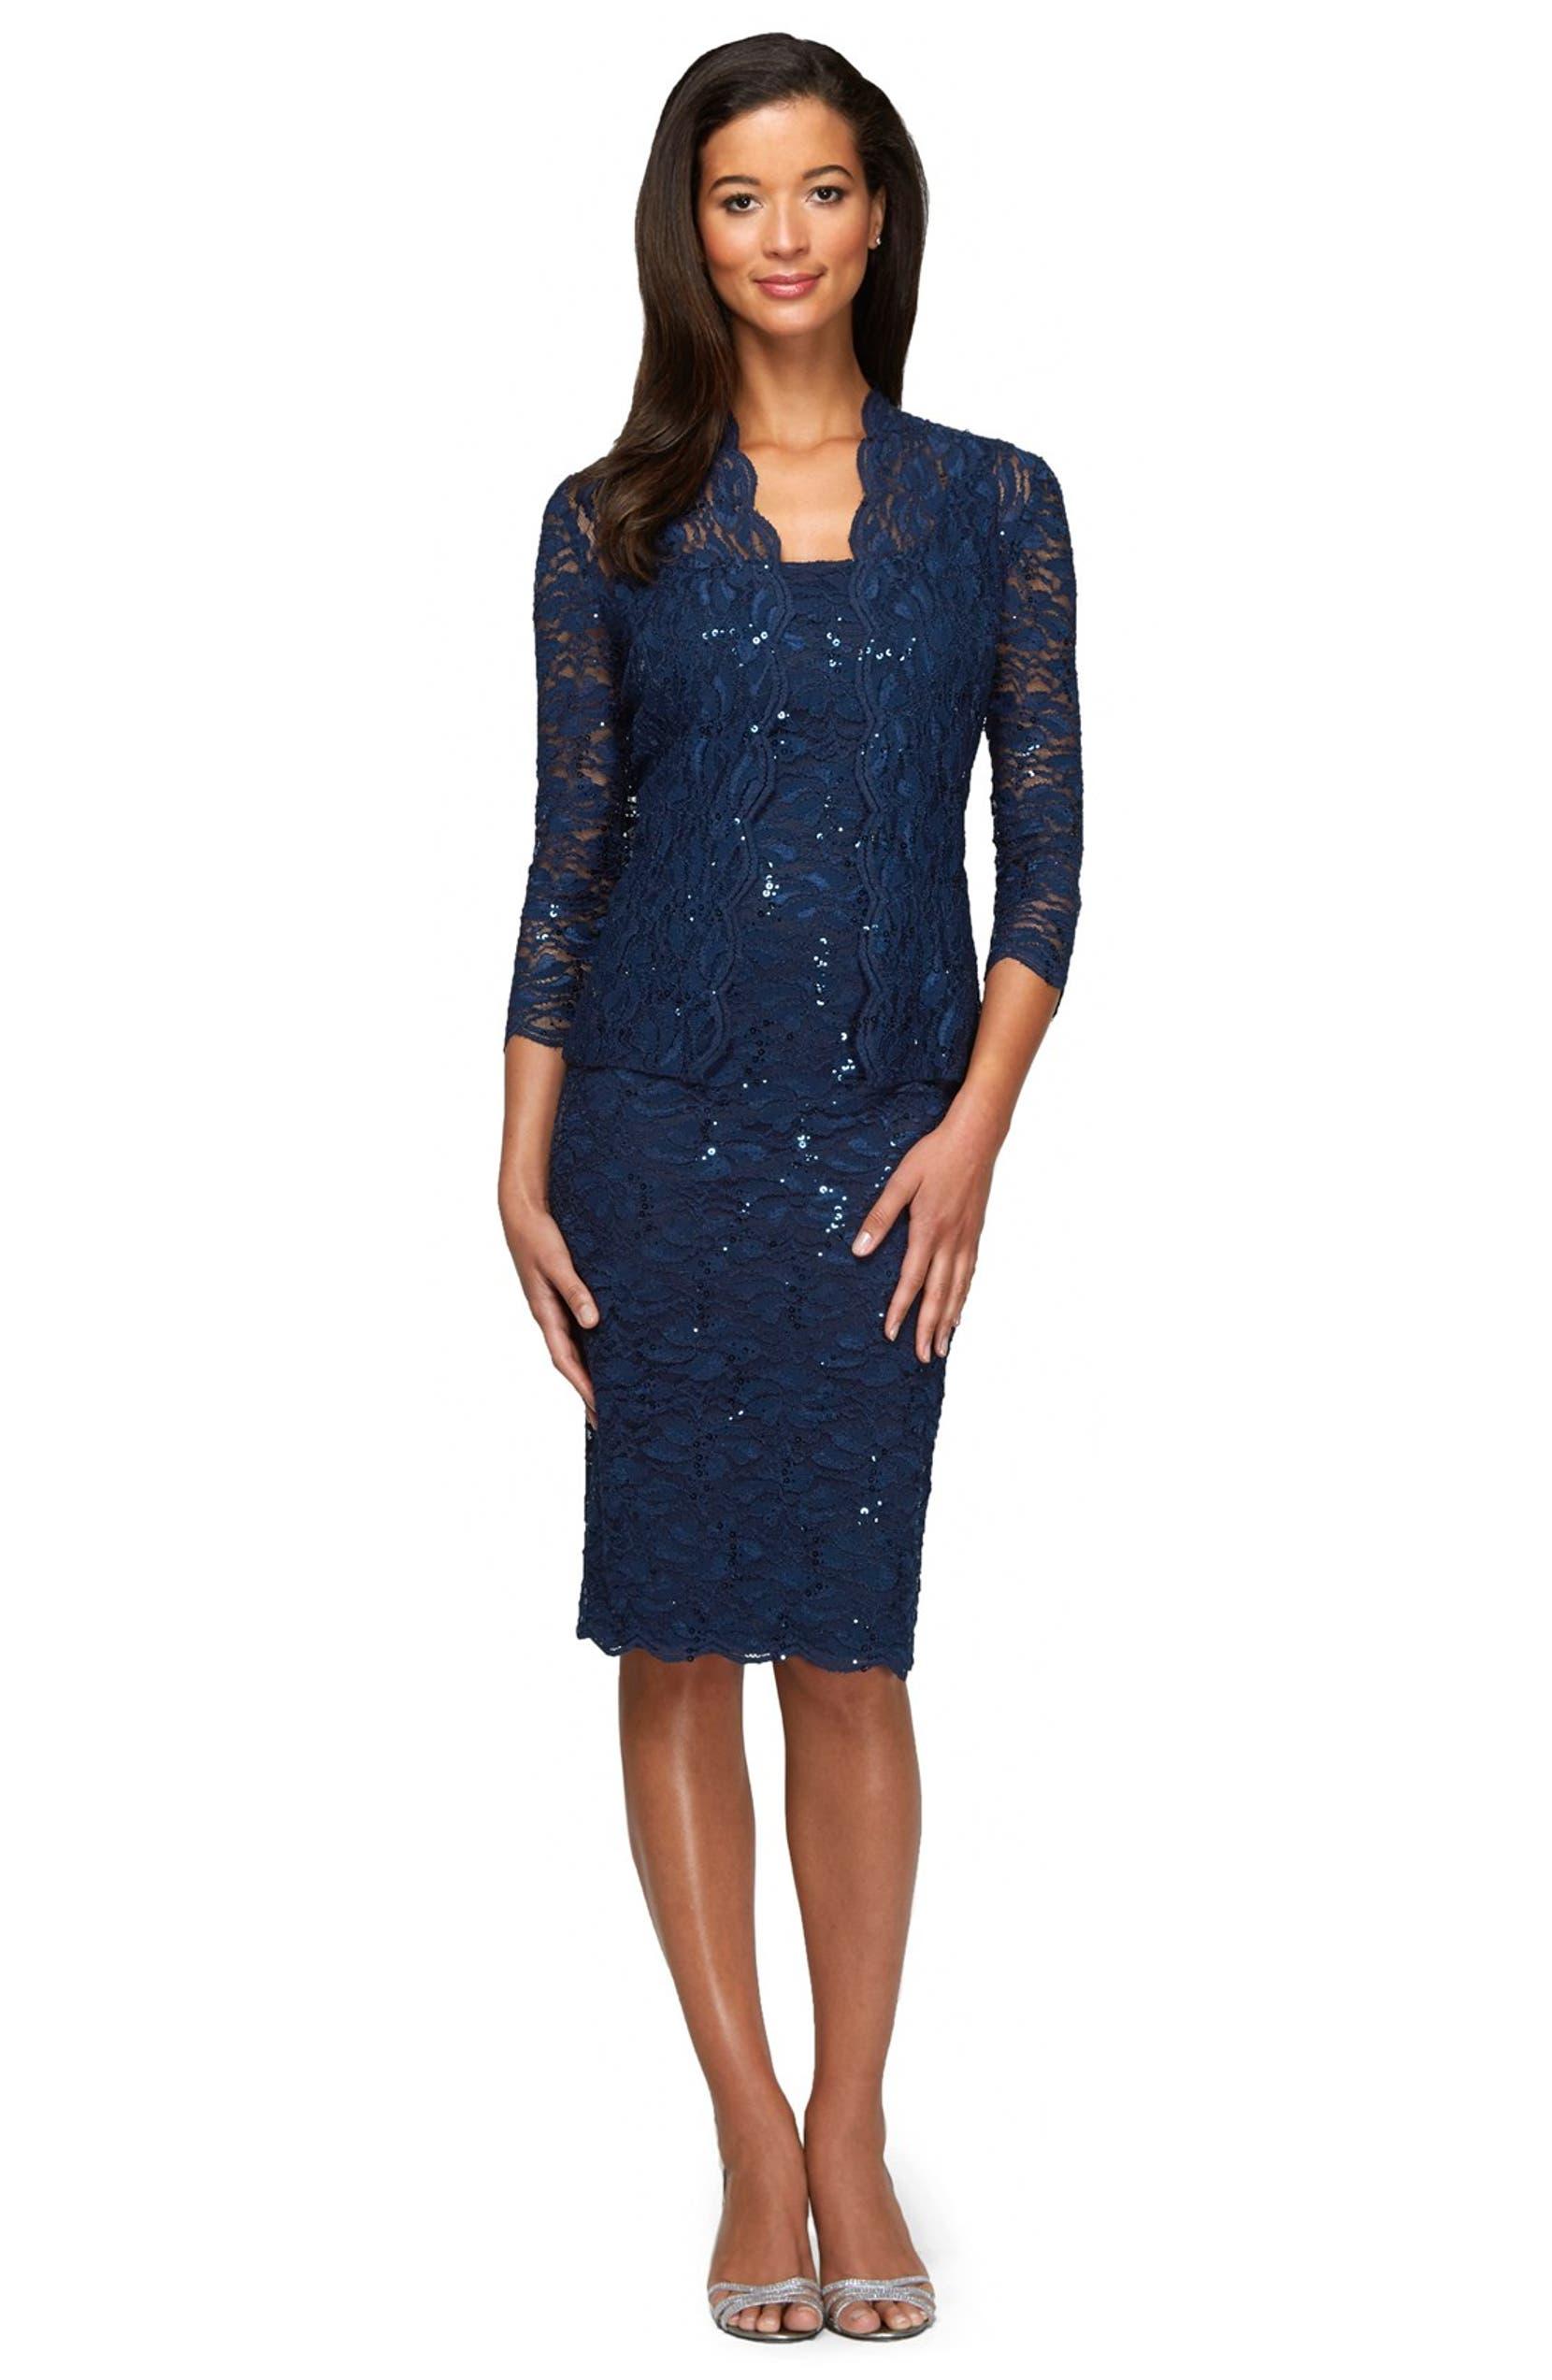 a4894644 Alex Evenings Lace Dress & Jacket (Regular & Petite)   Nordstrom